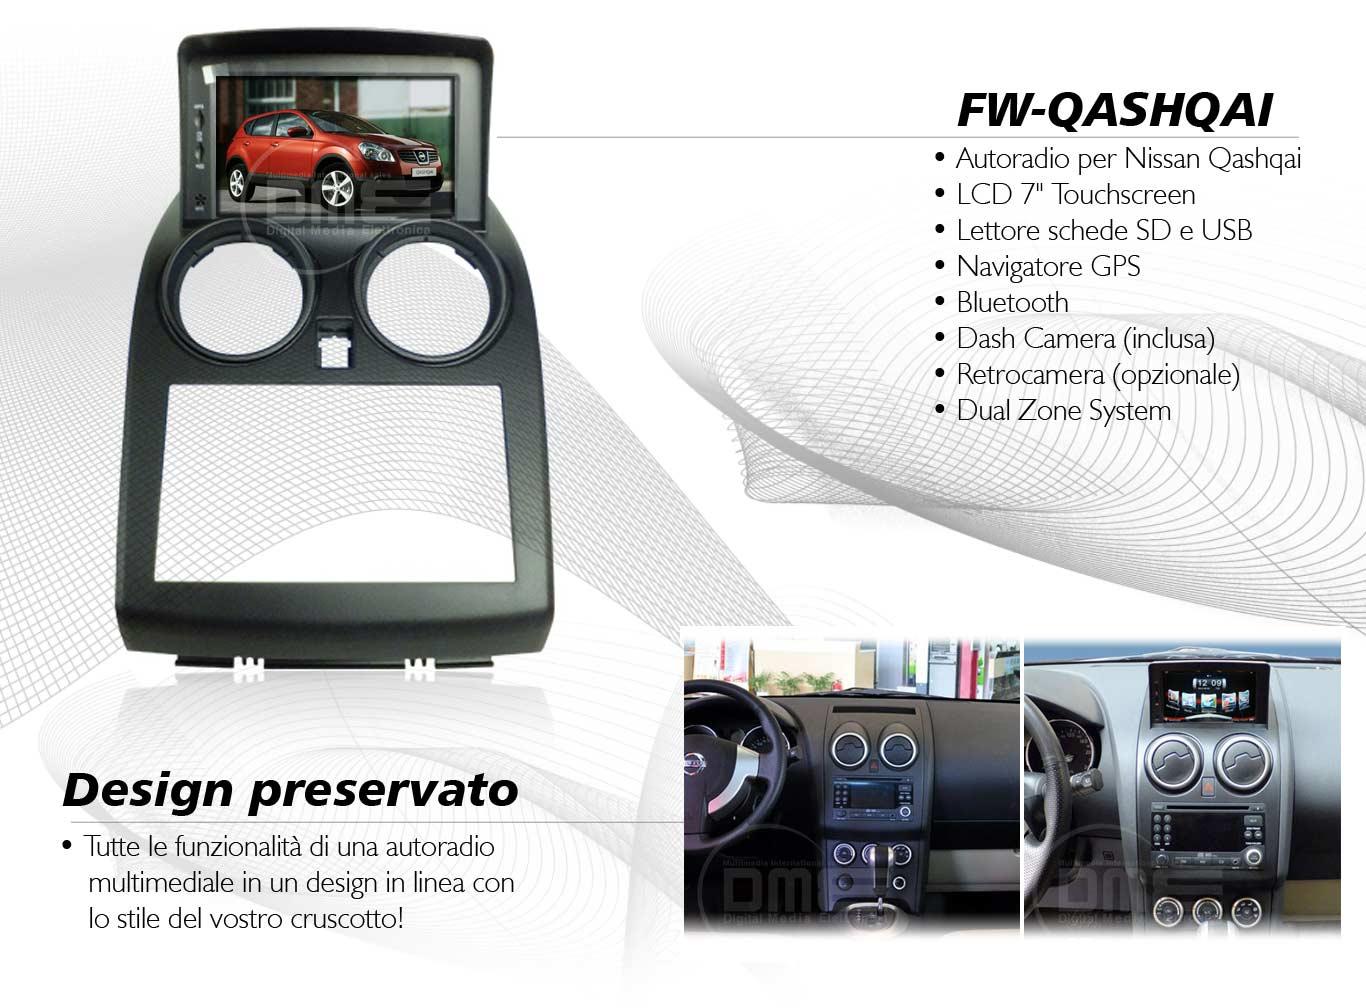 autoradio multimediale per Nissan Qashqai (fino al 2008)